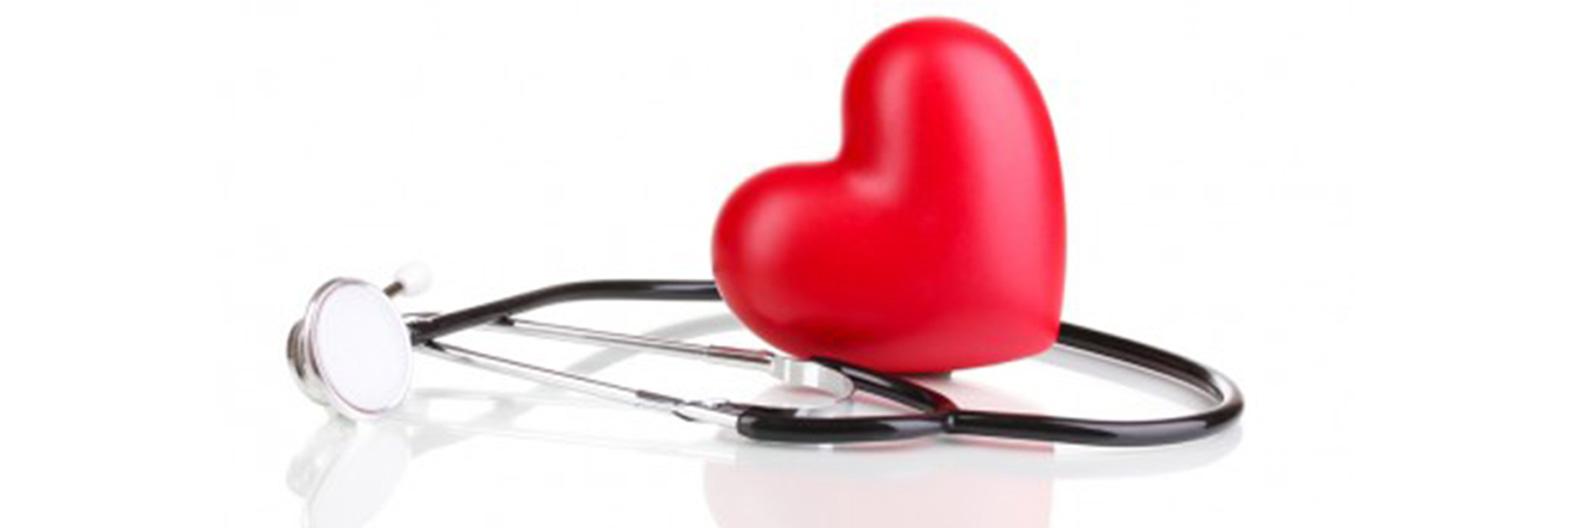 sergant hipertenzija, pulsas yra įtemptas